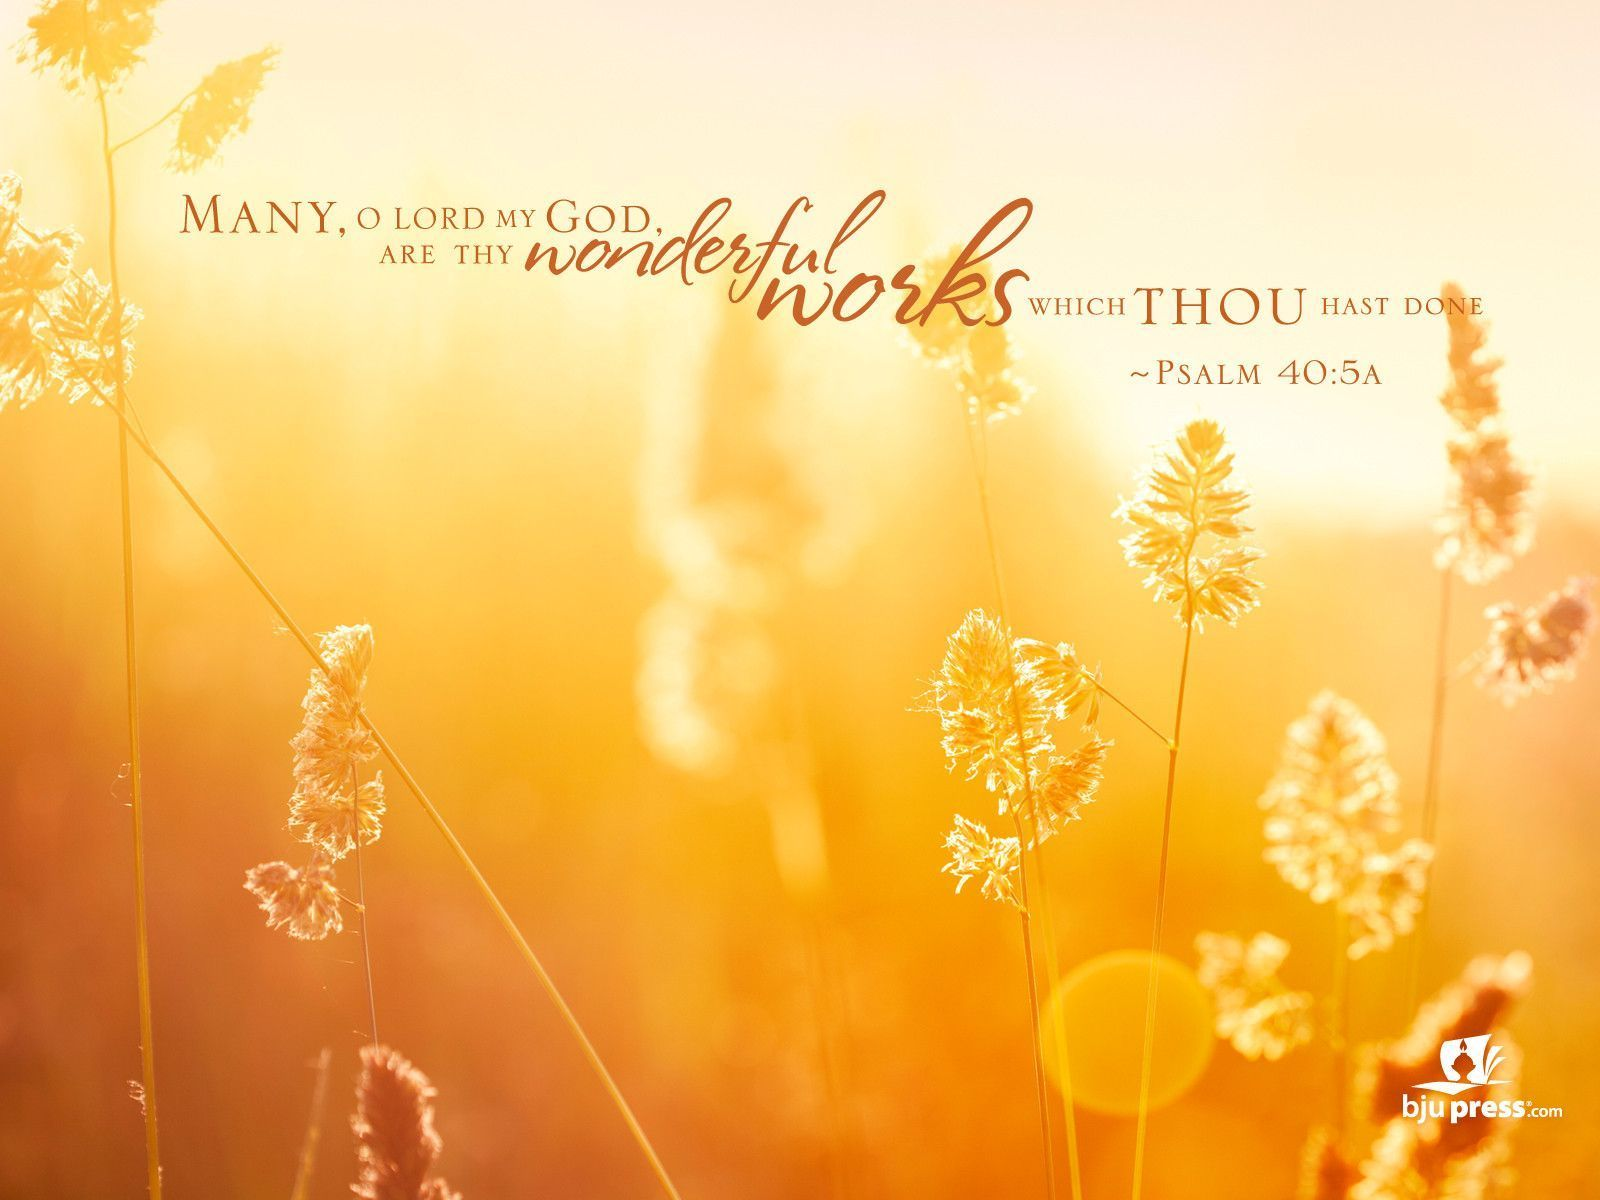 Christian Desktop Wallpaper with Scripture | Best Free ...